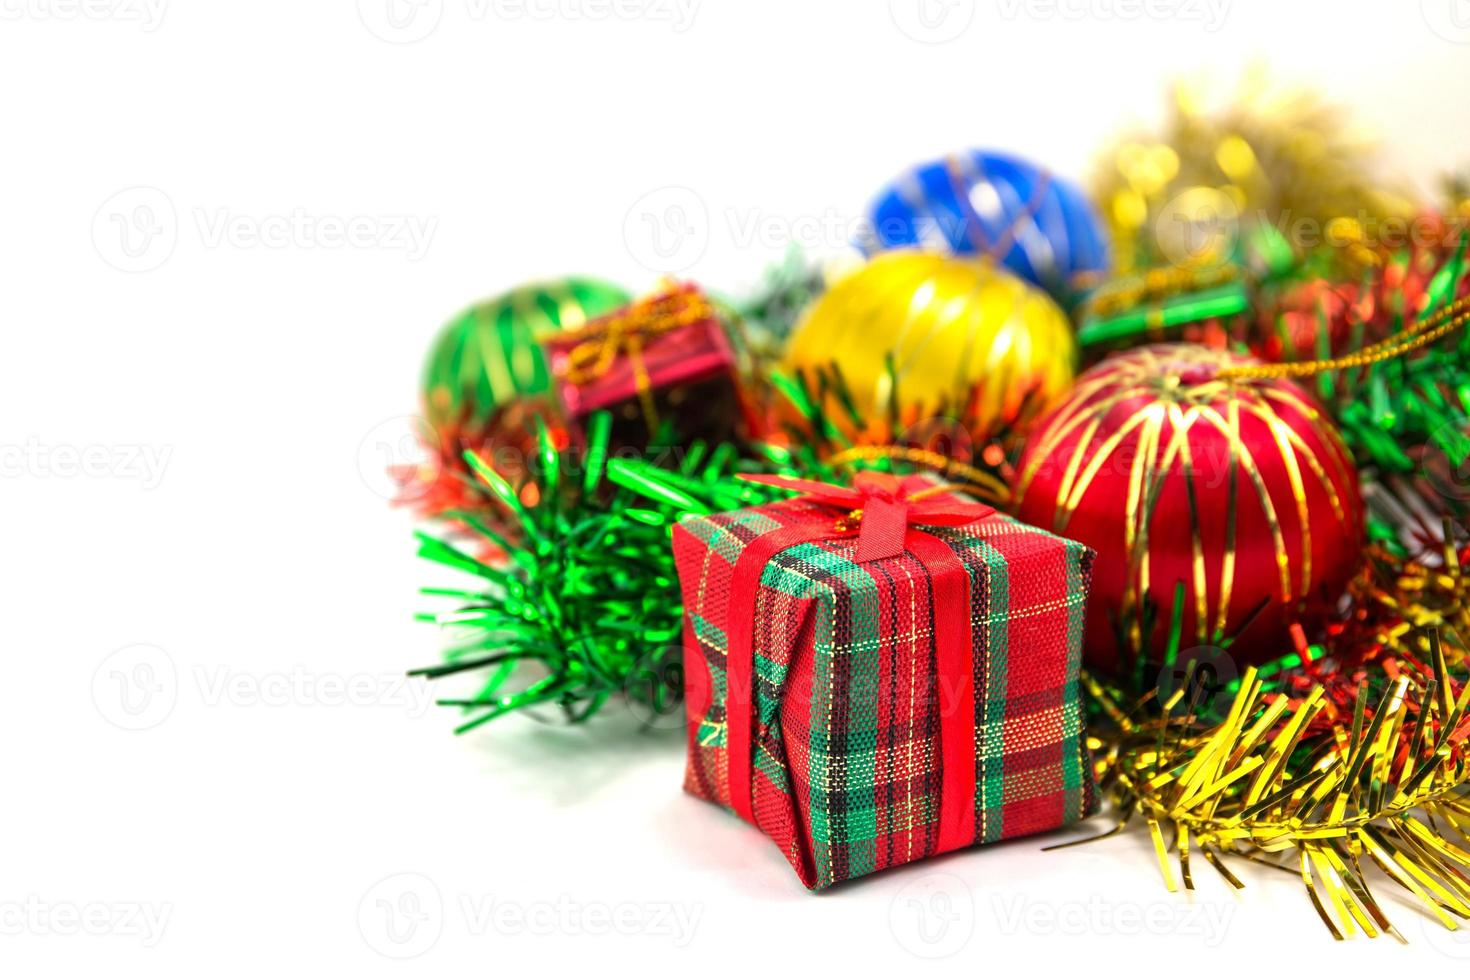 caixa de presente de natal com bolas de natal foto